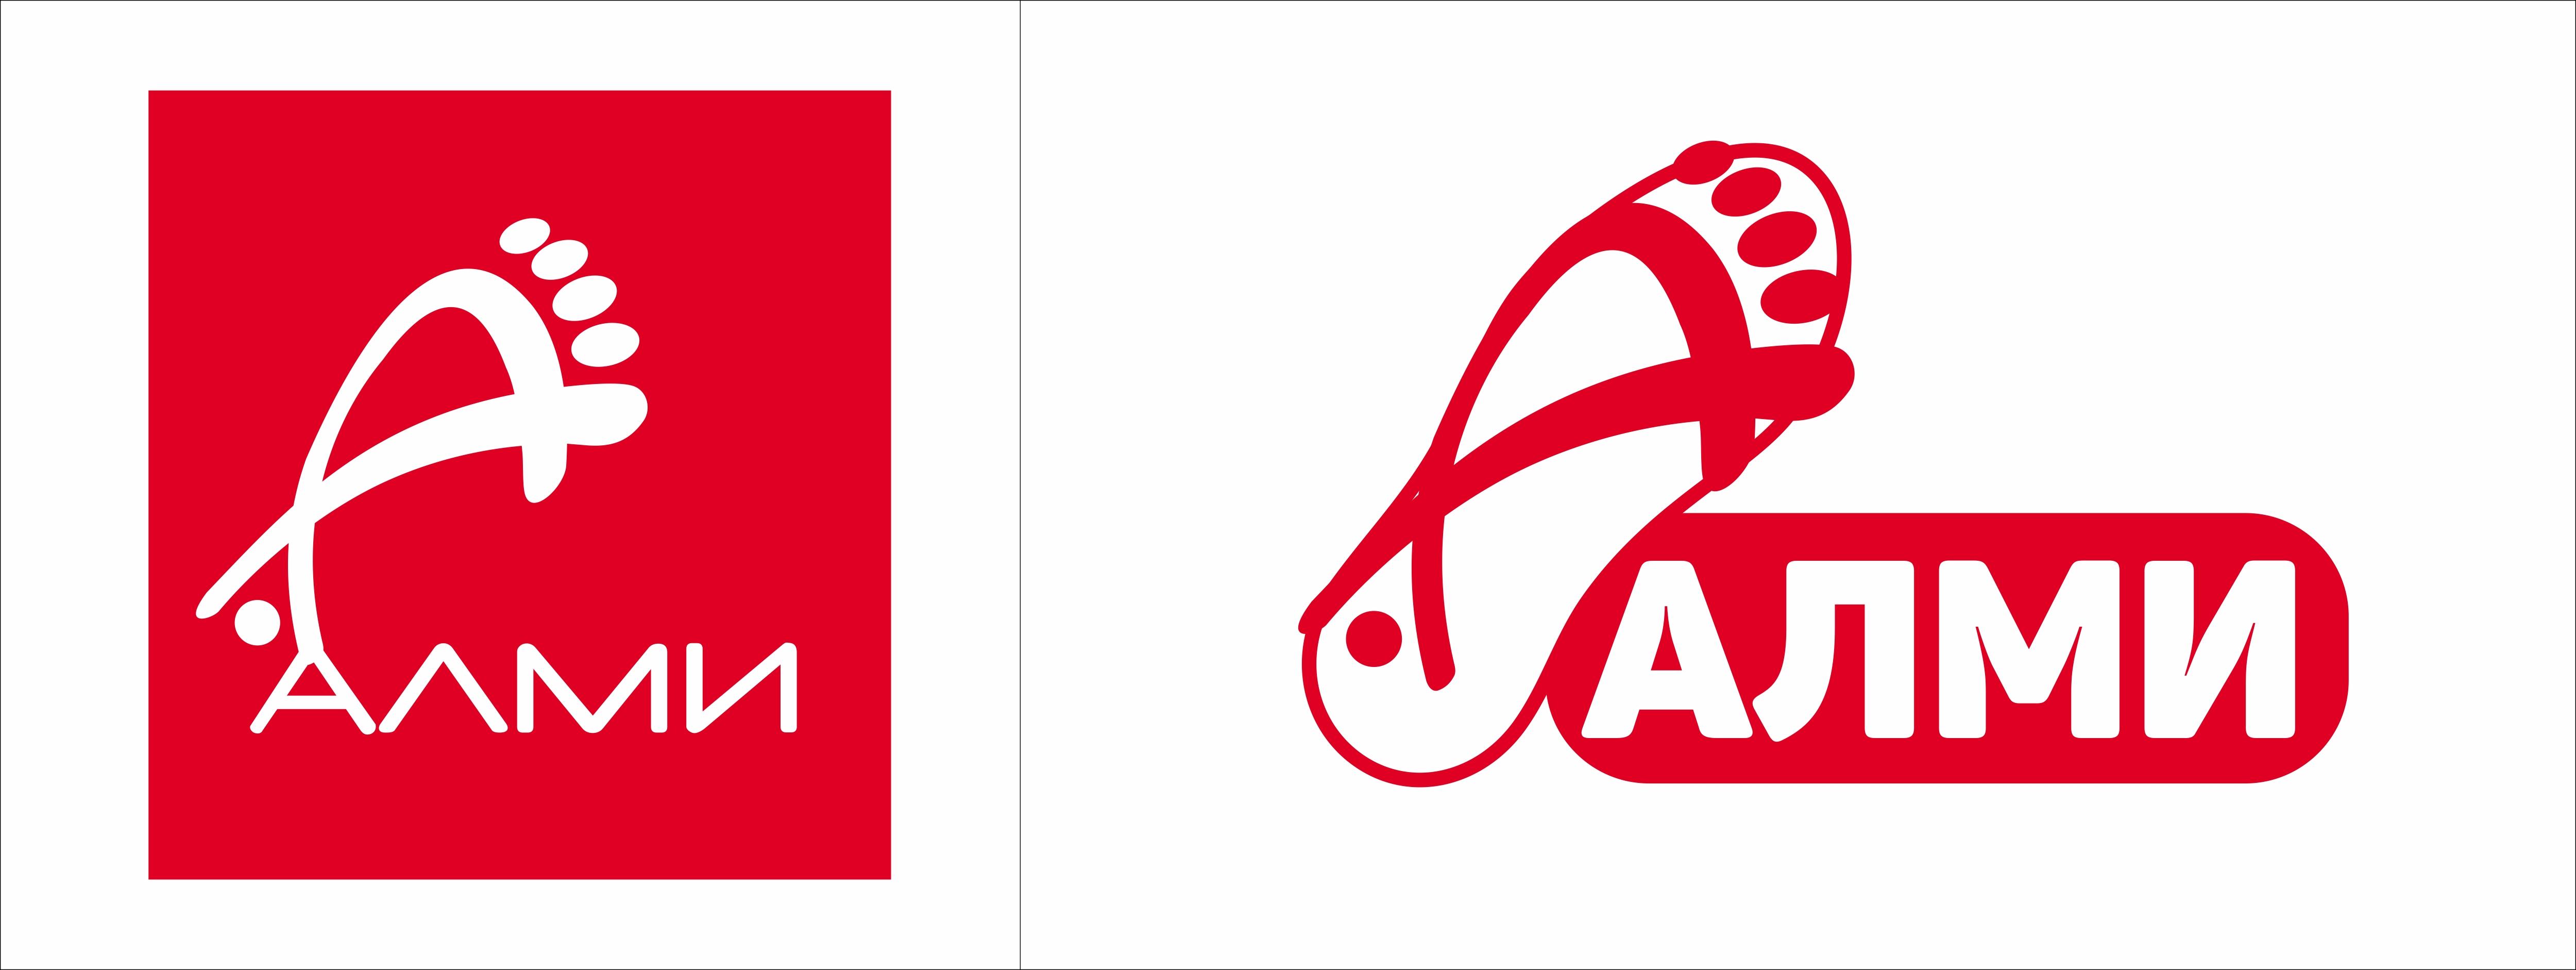 Дизайн логотипа обувной марки Алми фото f_65859e0fa05790b4.jpg